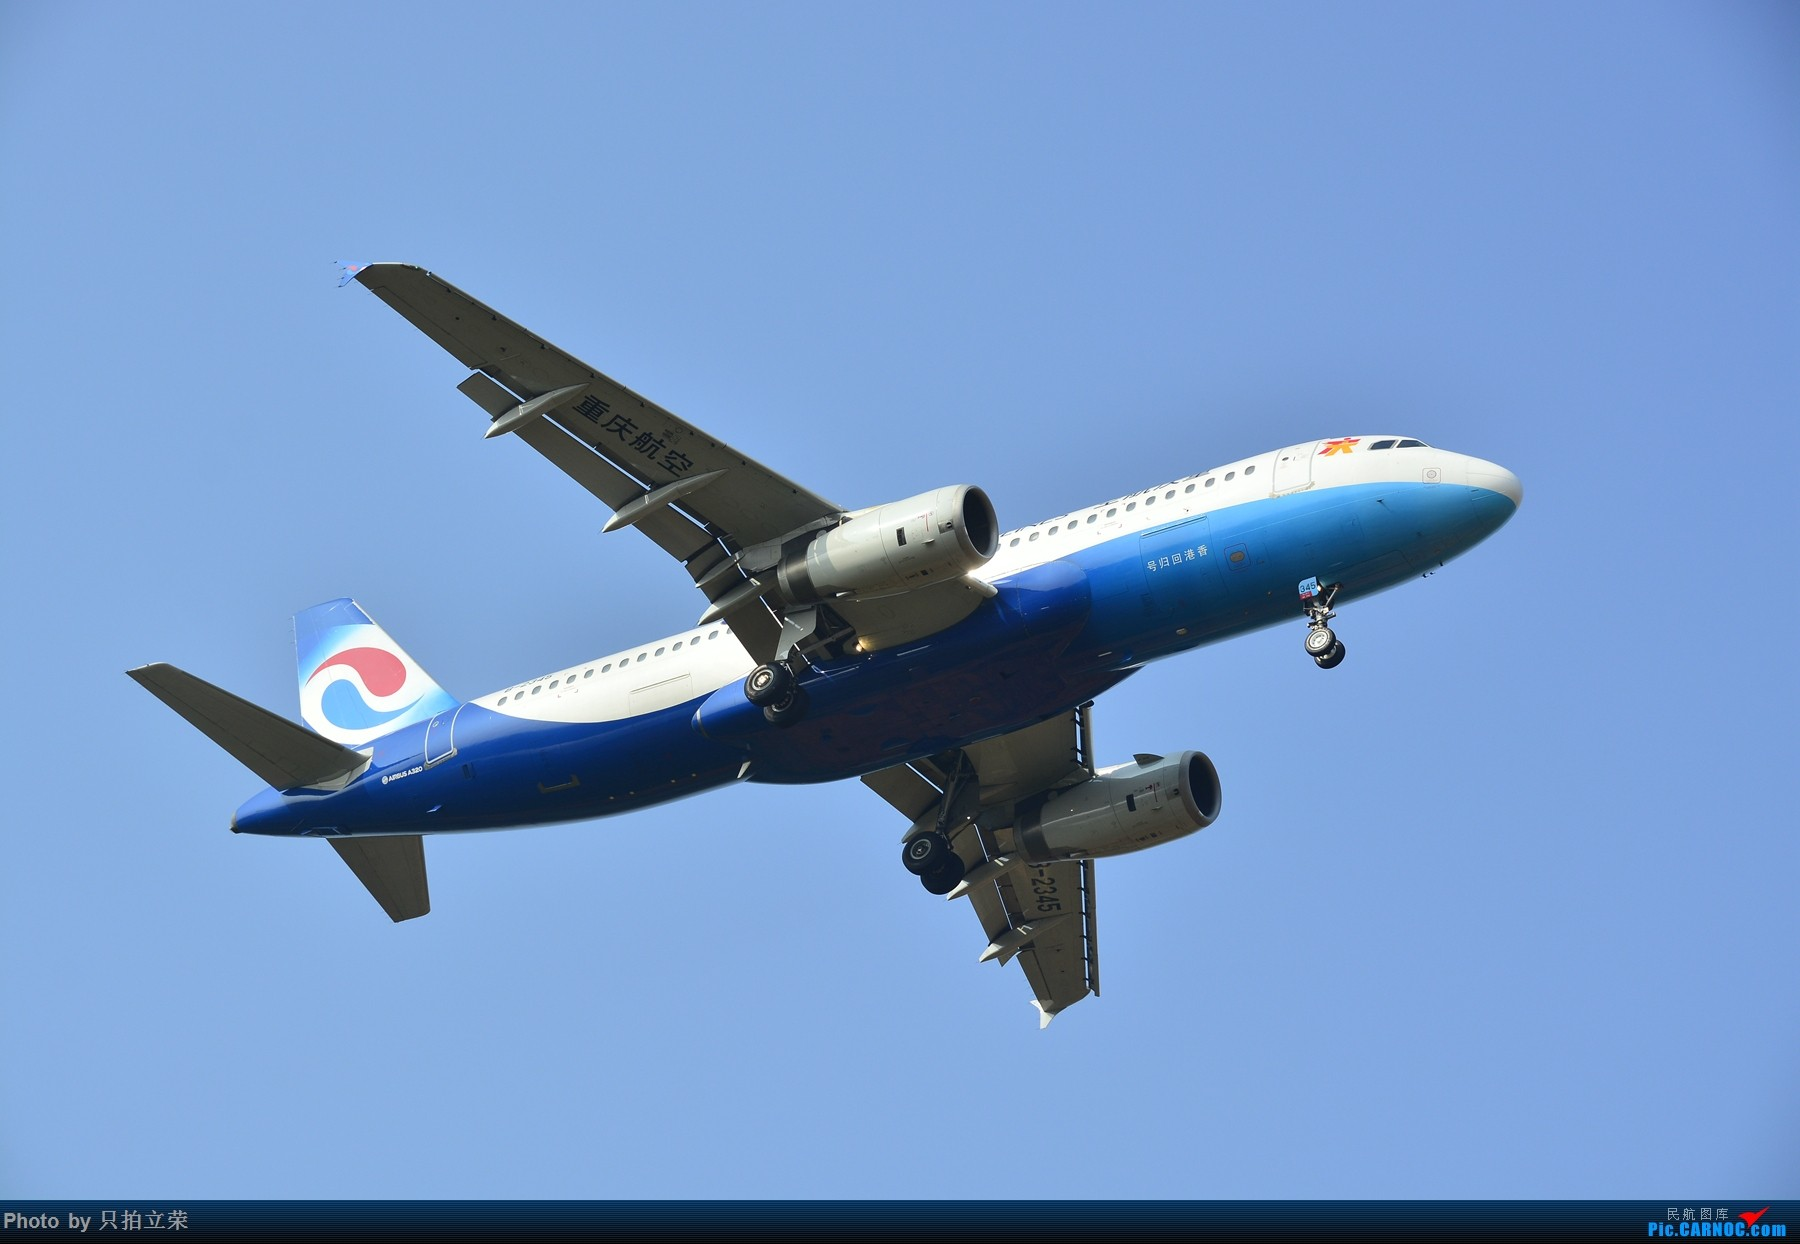 Re:[原创]湖南飞友会之10月9日长沙黄花好货满天飞! AIRBUS A320-200 B-2345 中国长沙黄花国际机场